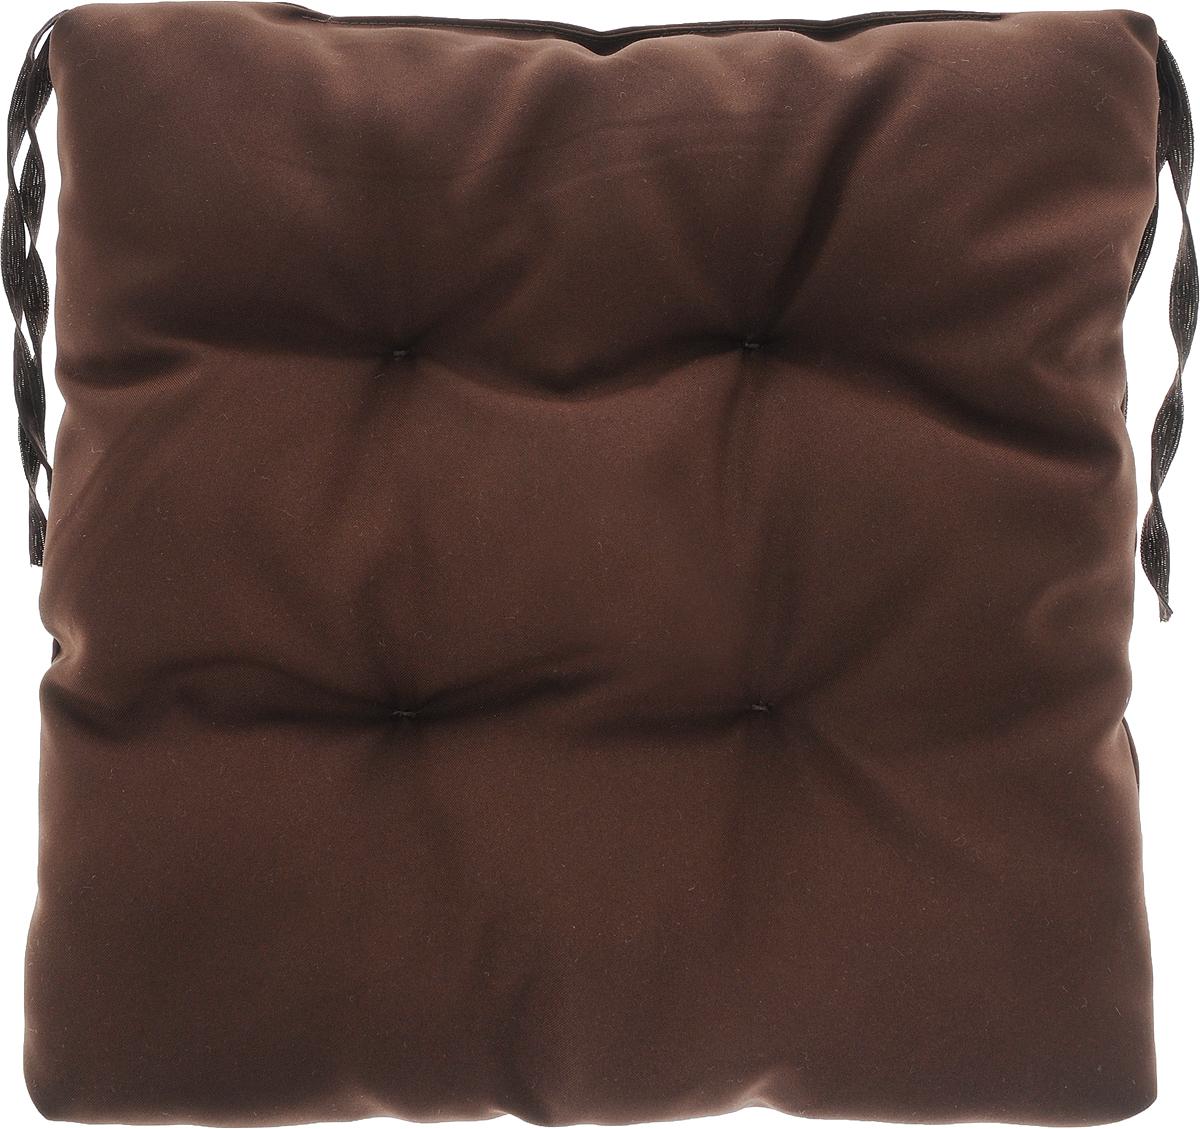 Подушка на стул Eva, объемная, цвет: коричневый, 40 х 40 см подушка на стул арти м райский сад